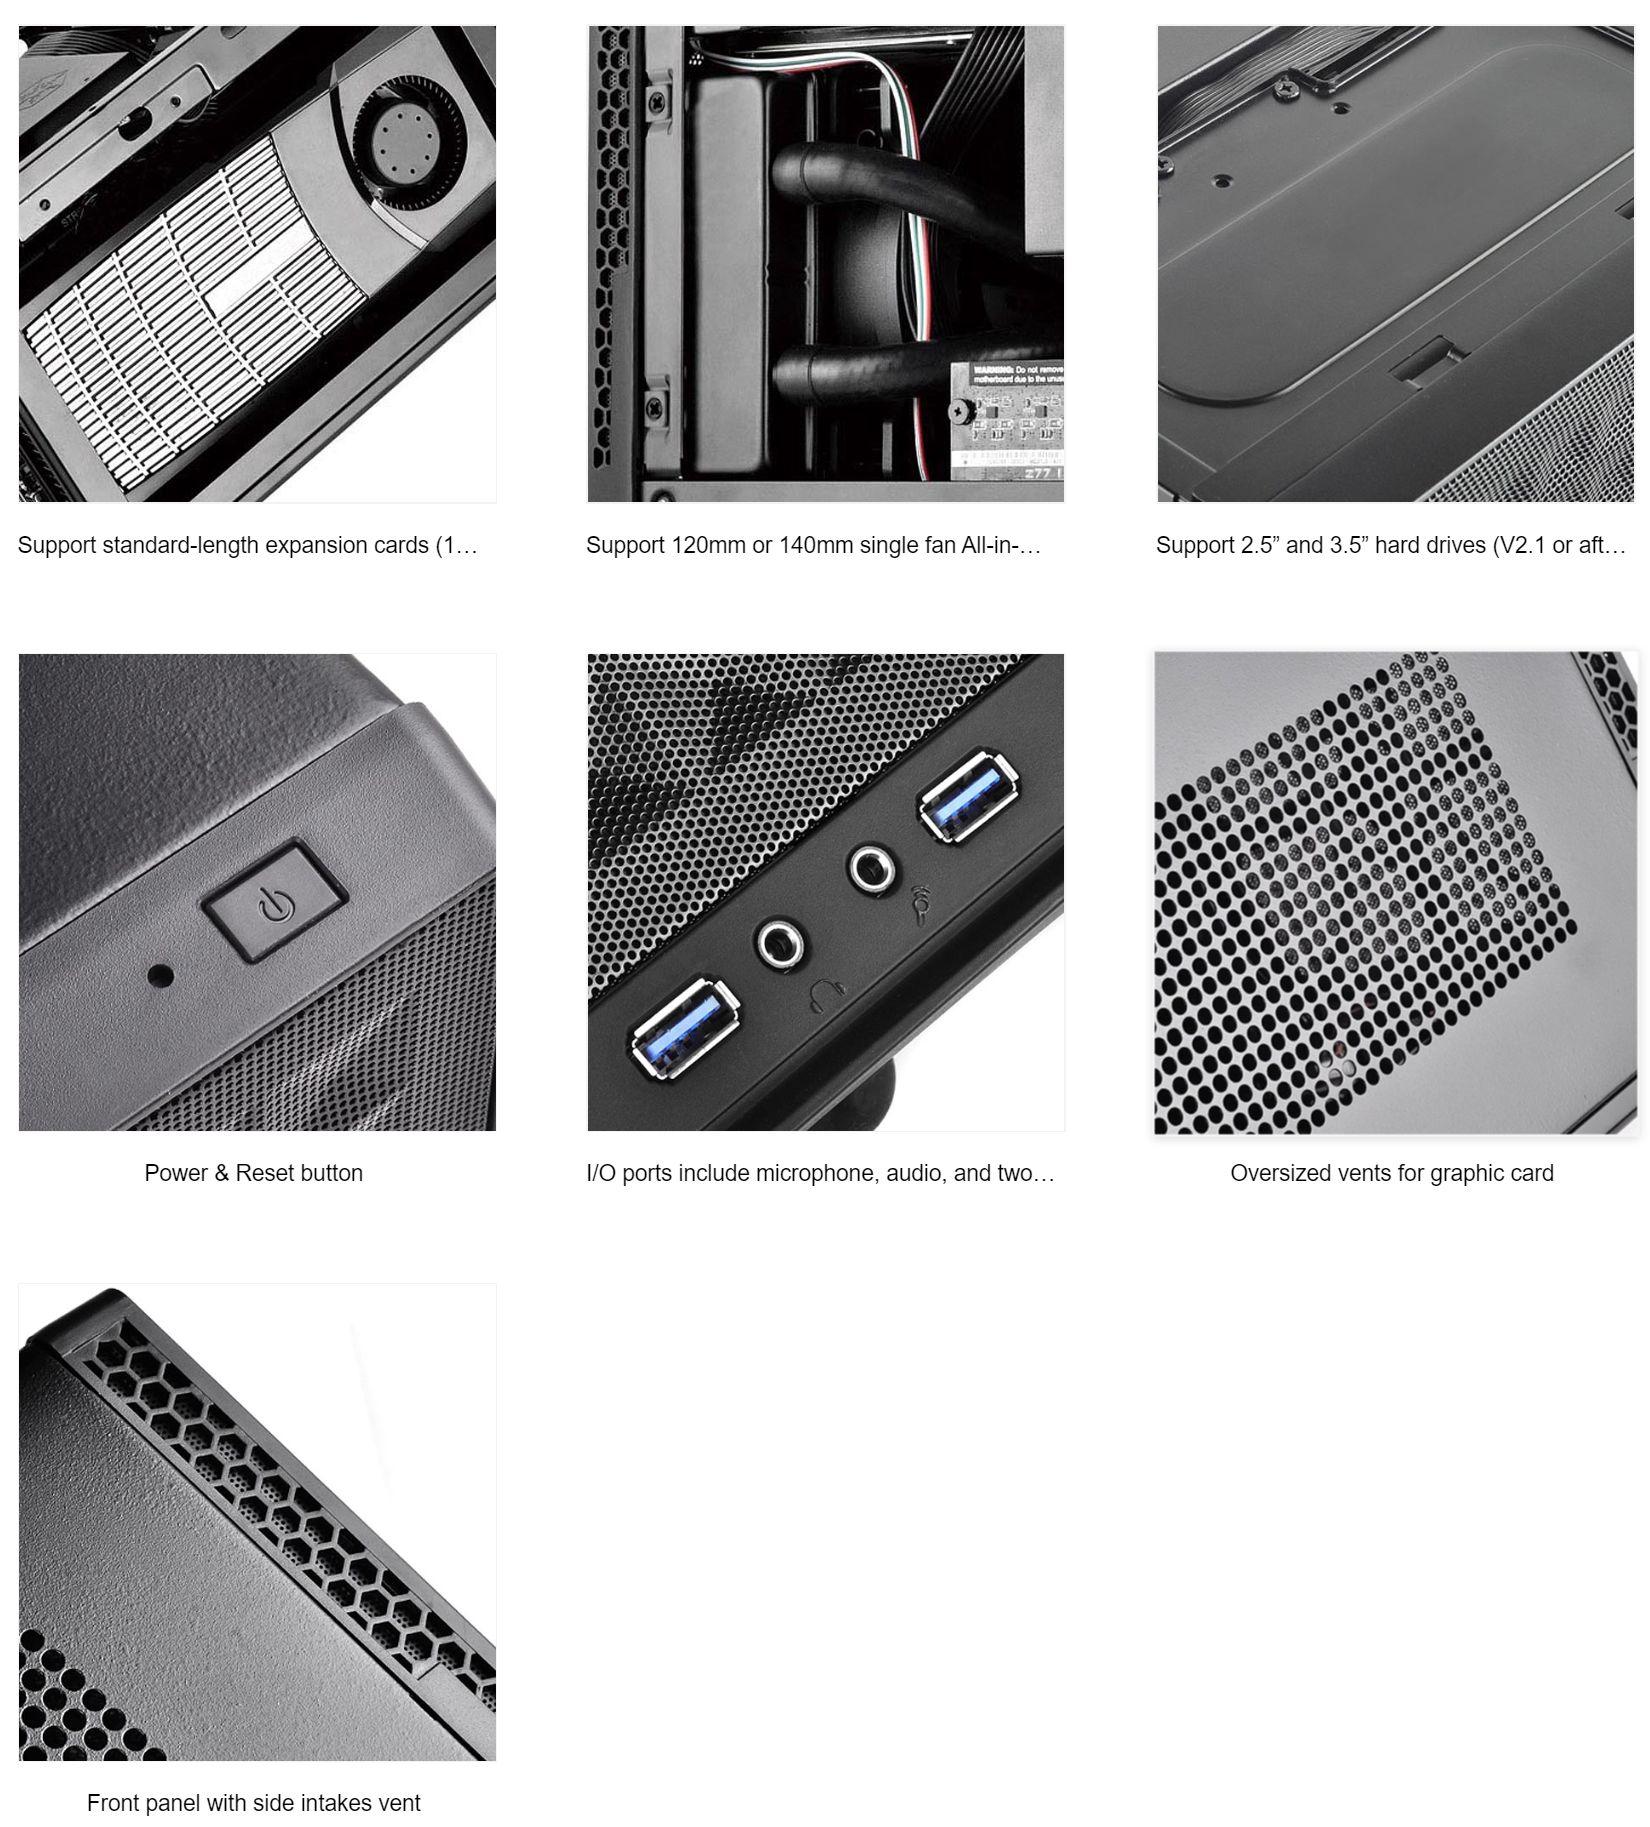 #1435 - 'SilverStone INTRODUCTION?SG13' - silverstonetek_com.jpg